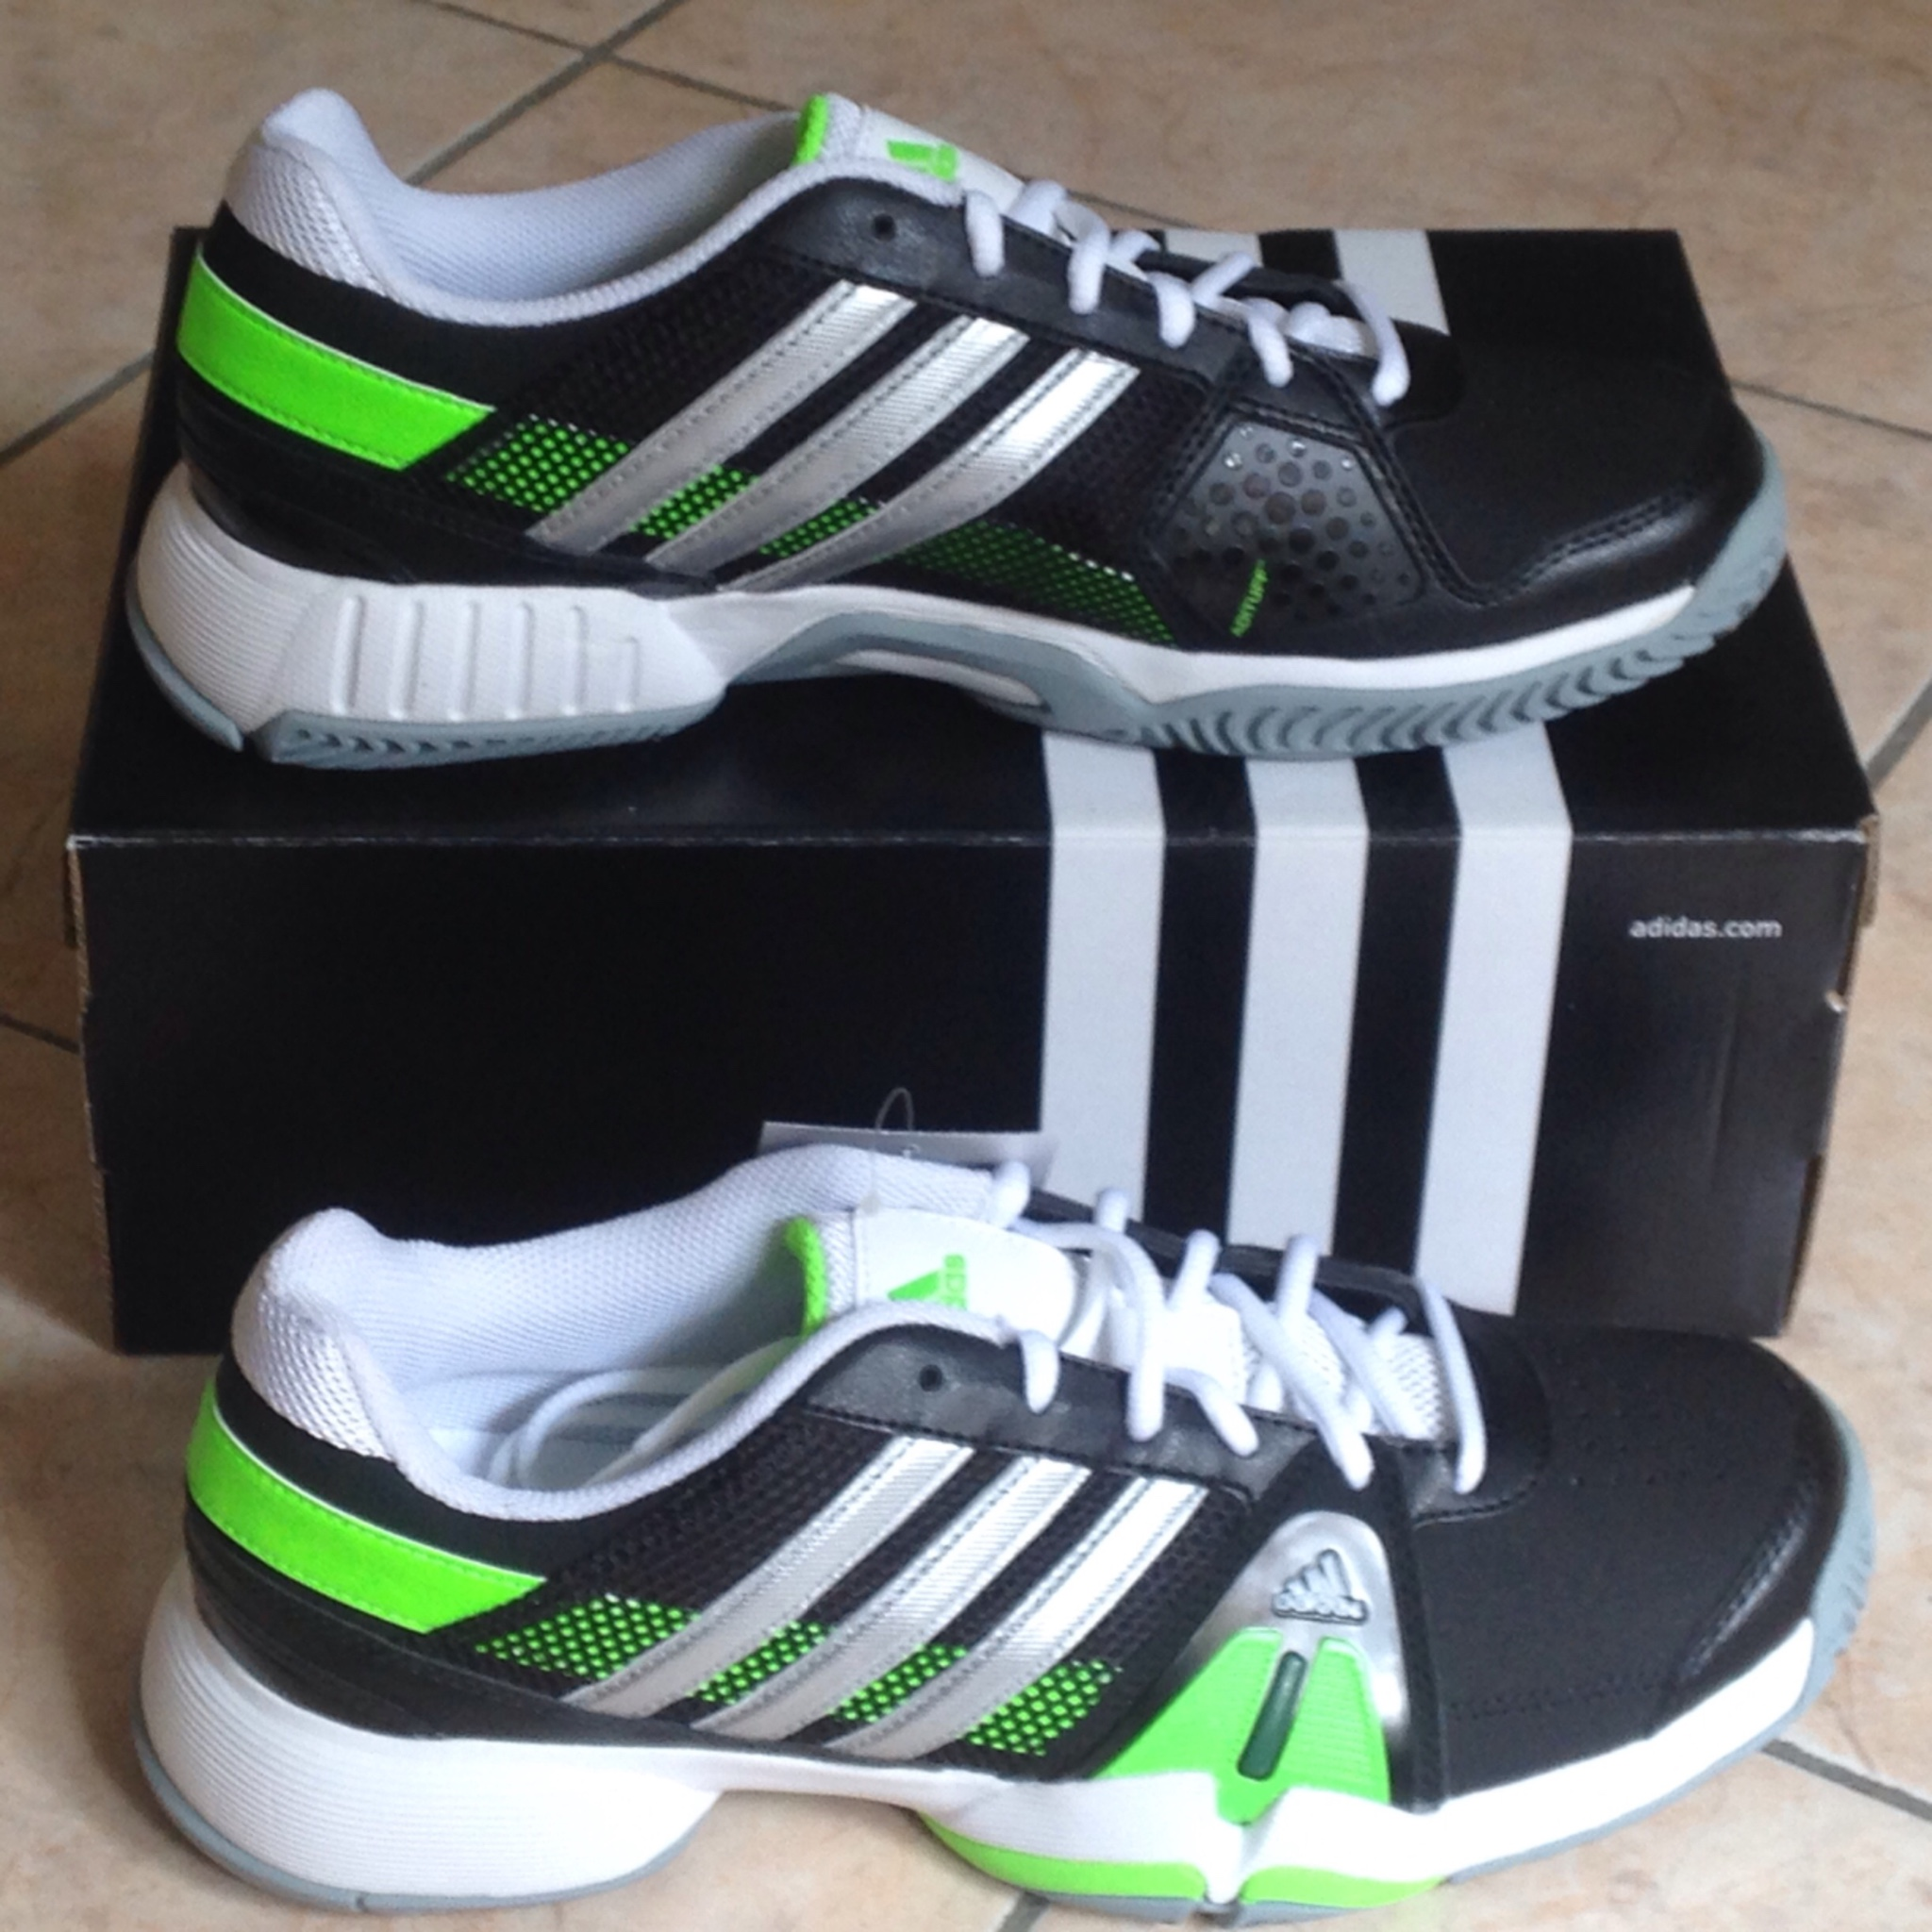 Jual Adidas Barricade Team Hitam 3 sz 39 1 3 Sepatu Tenis Sportsite